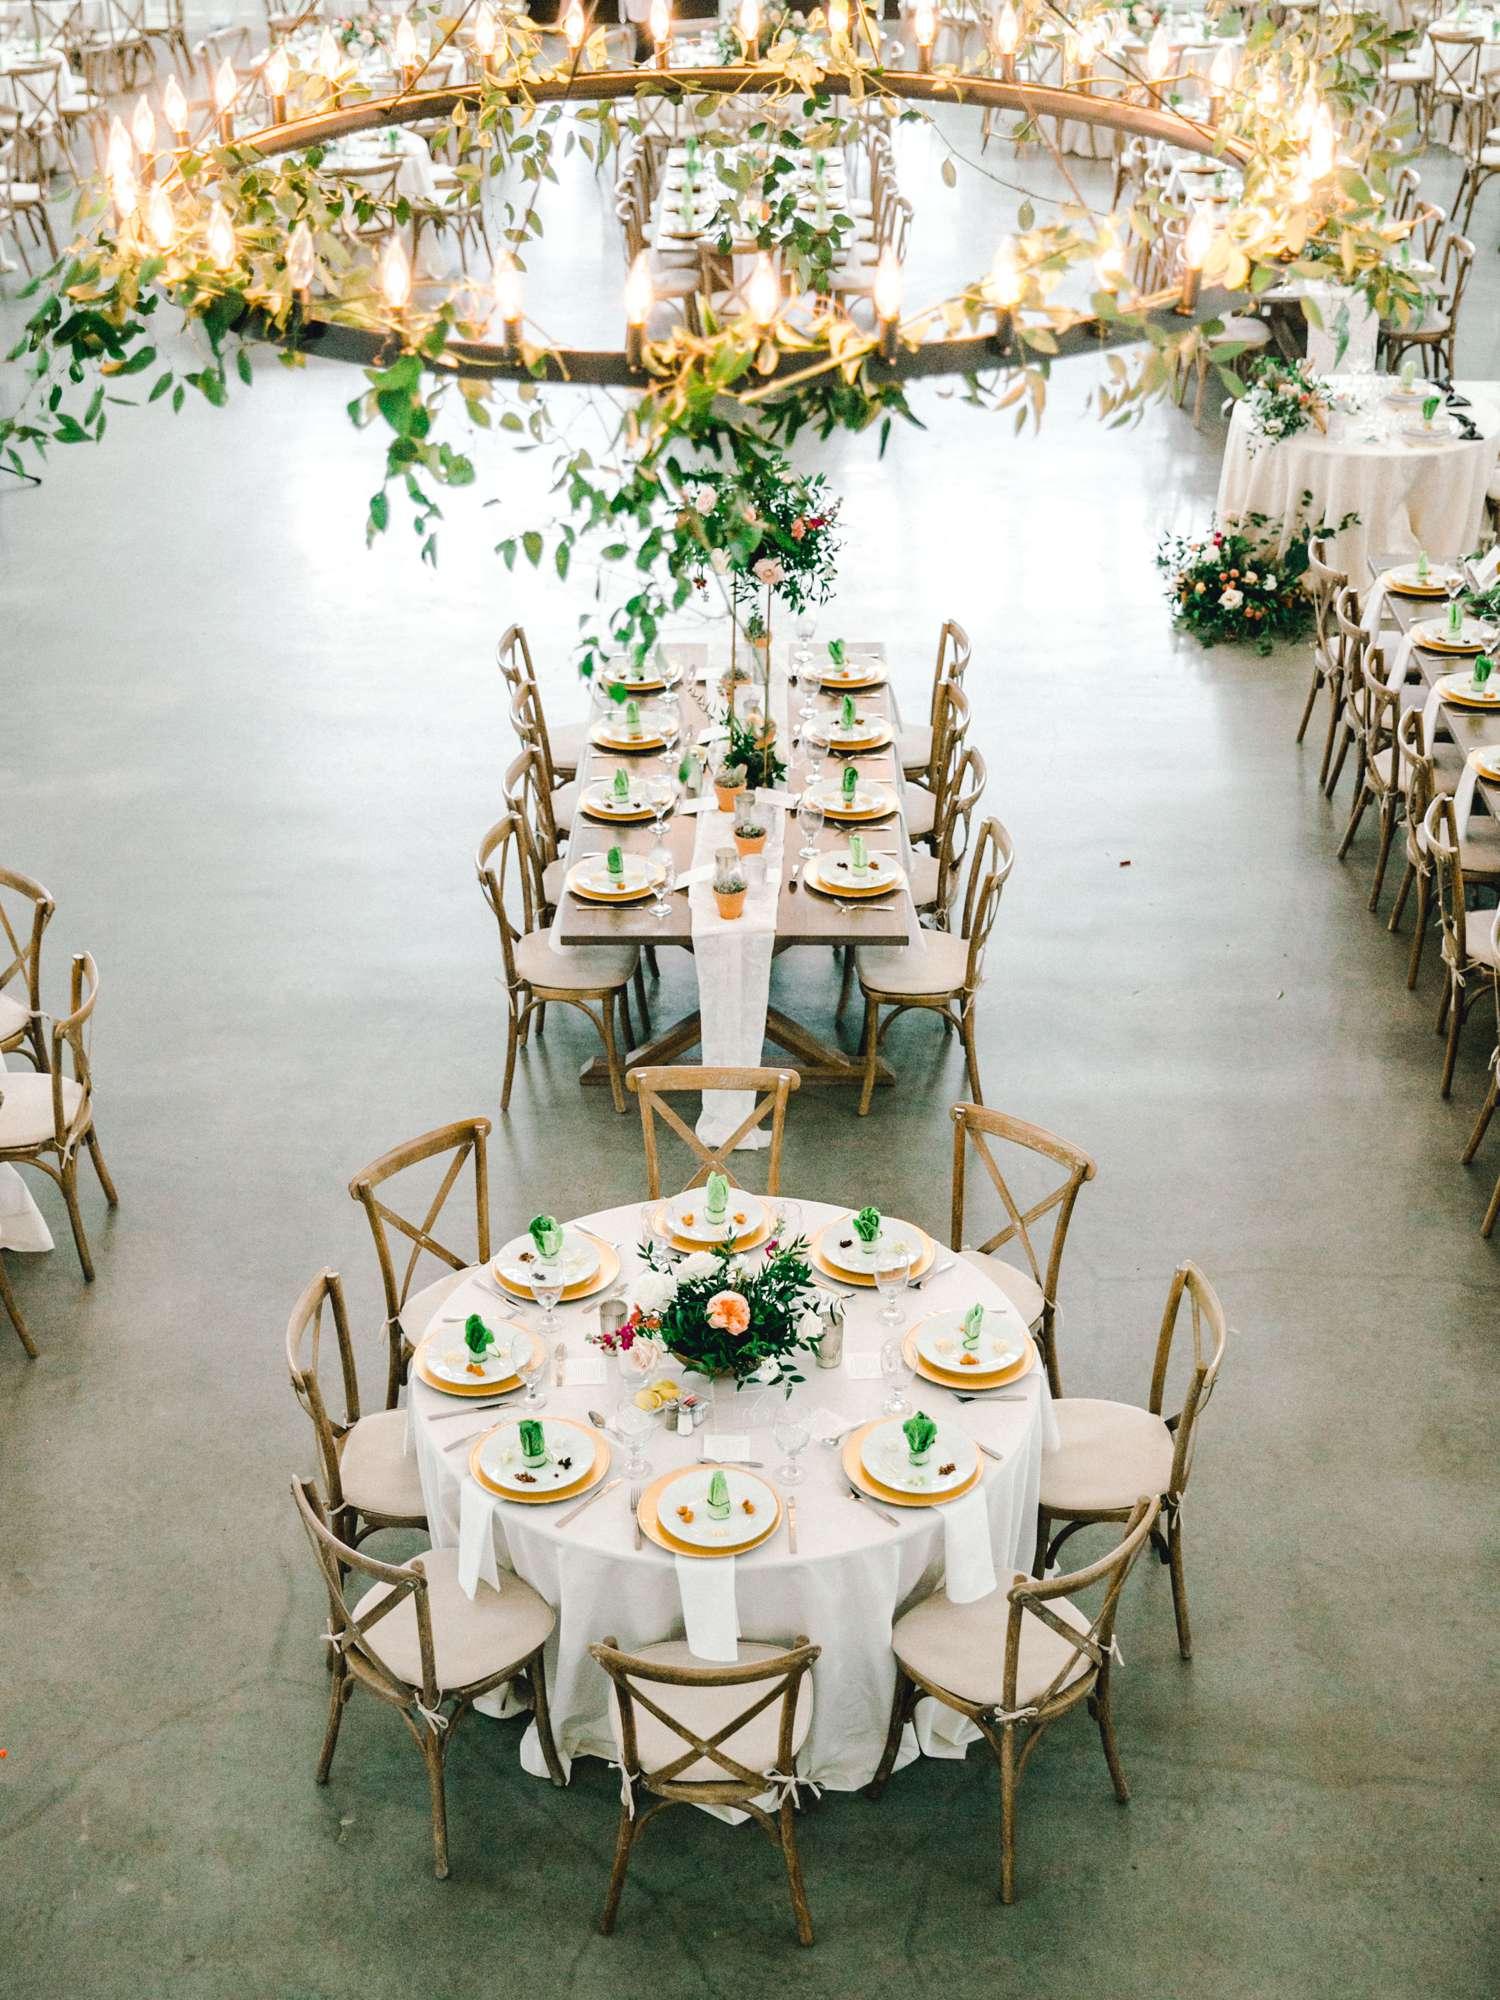 HEBERT_MORGAN_AND_CLAY_ALLEEJ_THE_FARMHOUSE_MONTGOMERY_TEXAS_WEDDING_0127.jpg